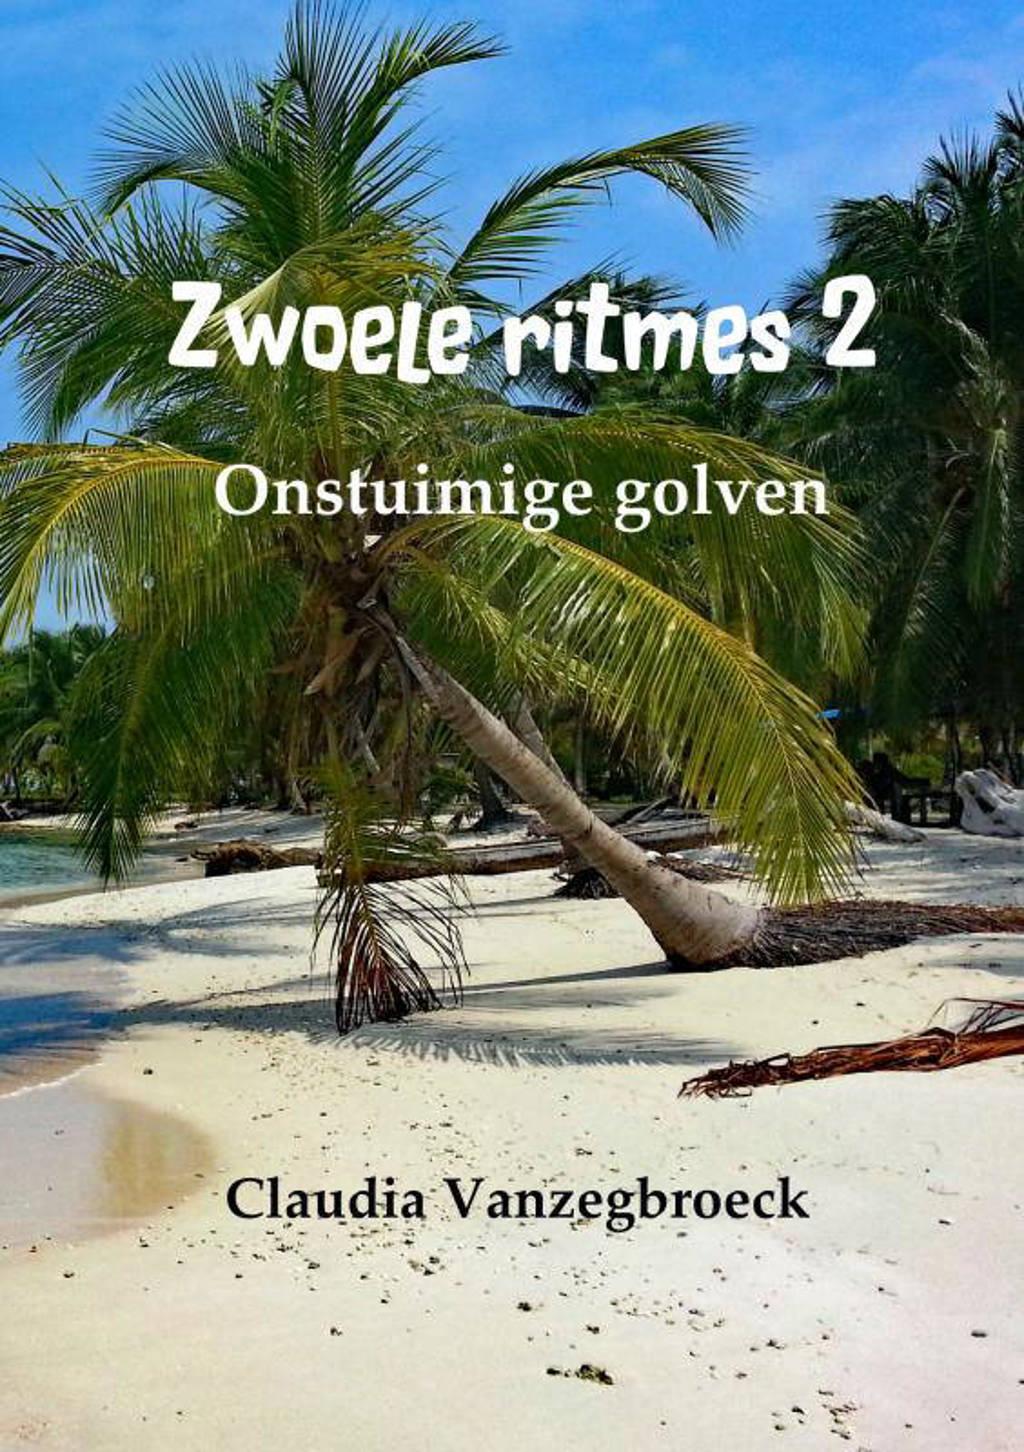 Zwoele ritmes 2 - Claudia Vanzegbroeck